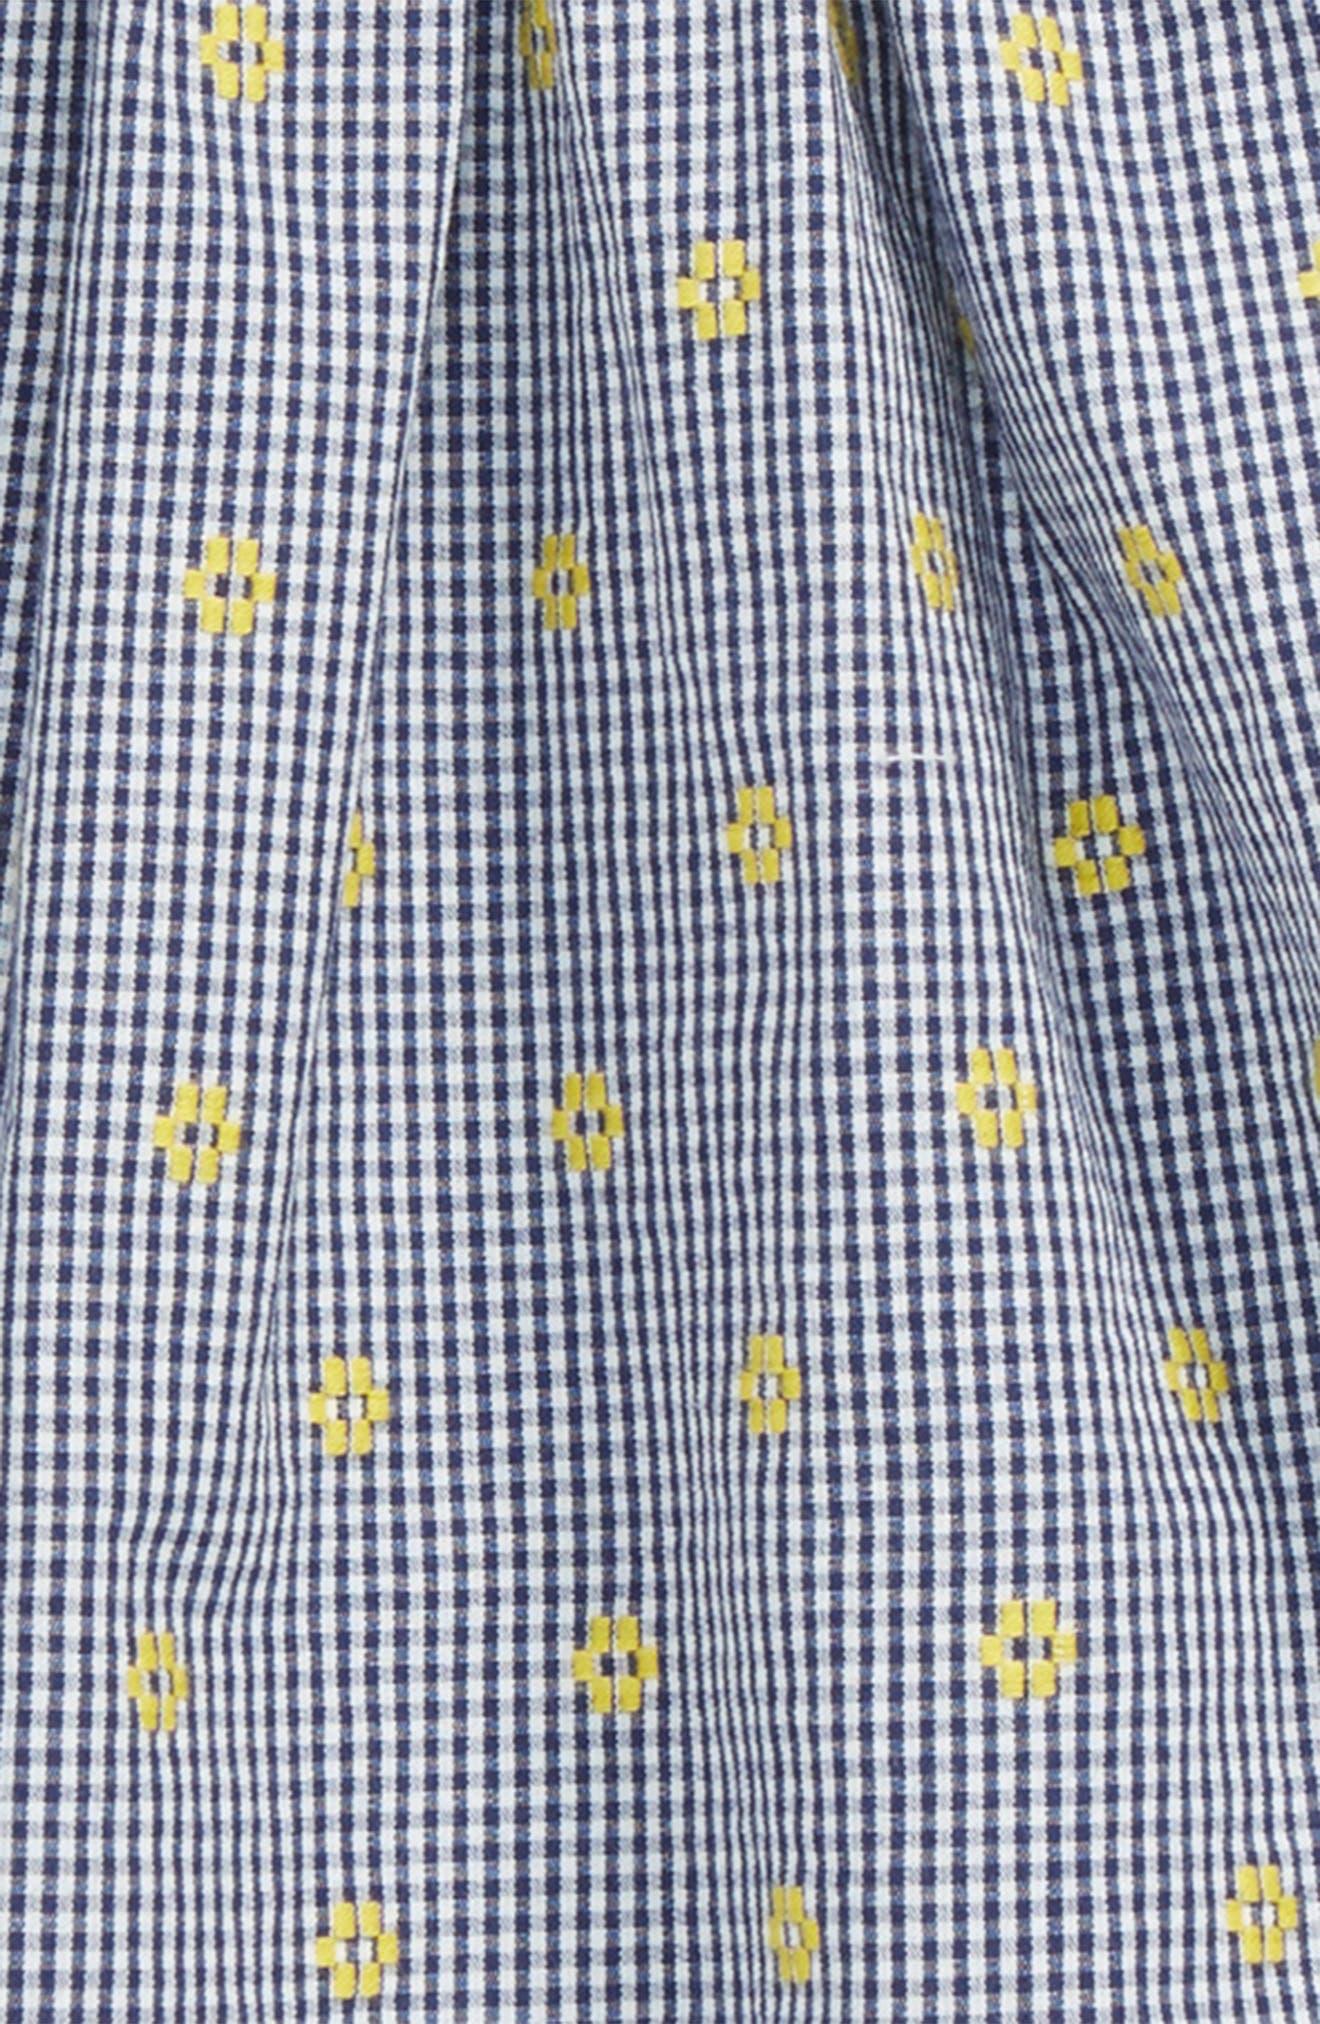 Flutter Sleeve Tunic & Shorts Set,                             Alternate thumbnail 2, color,                             Navy Ribbon- White Daisy